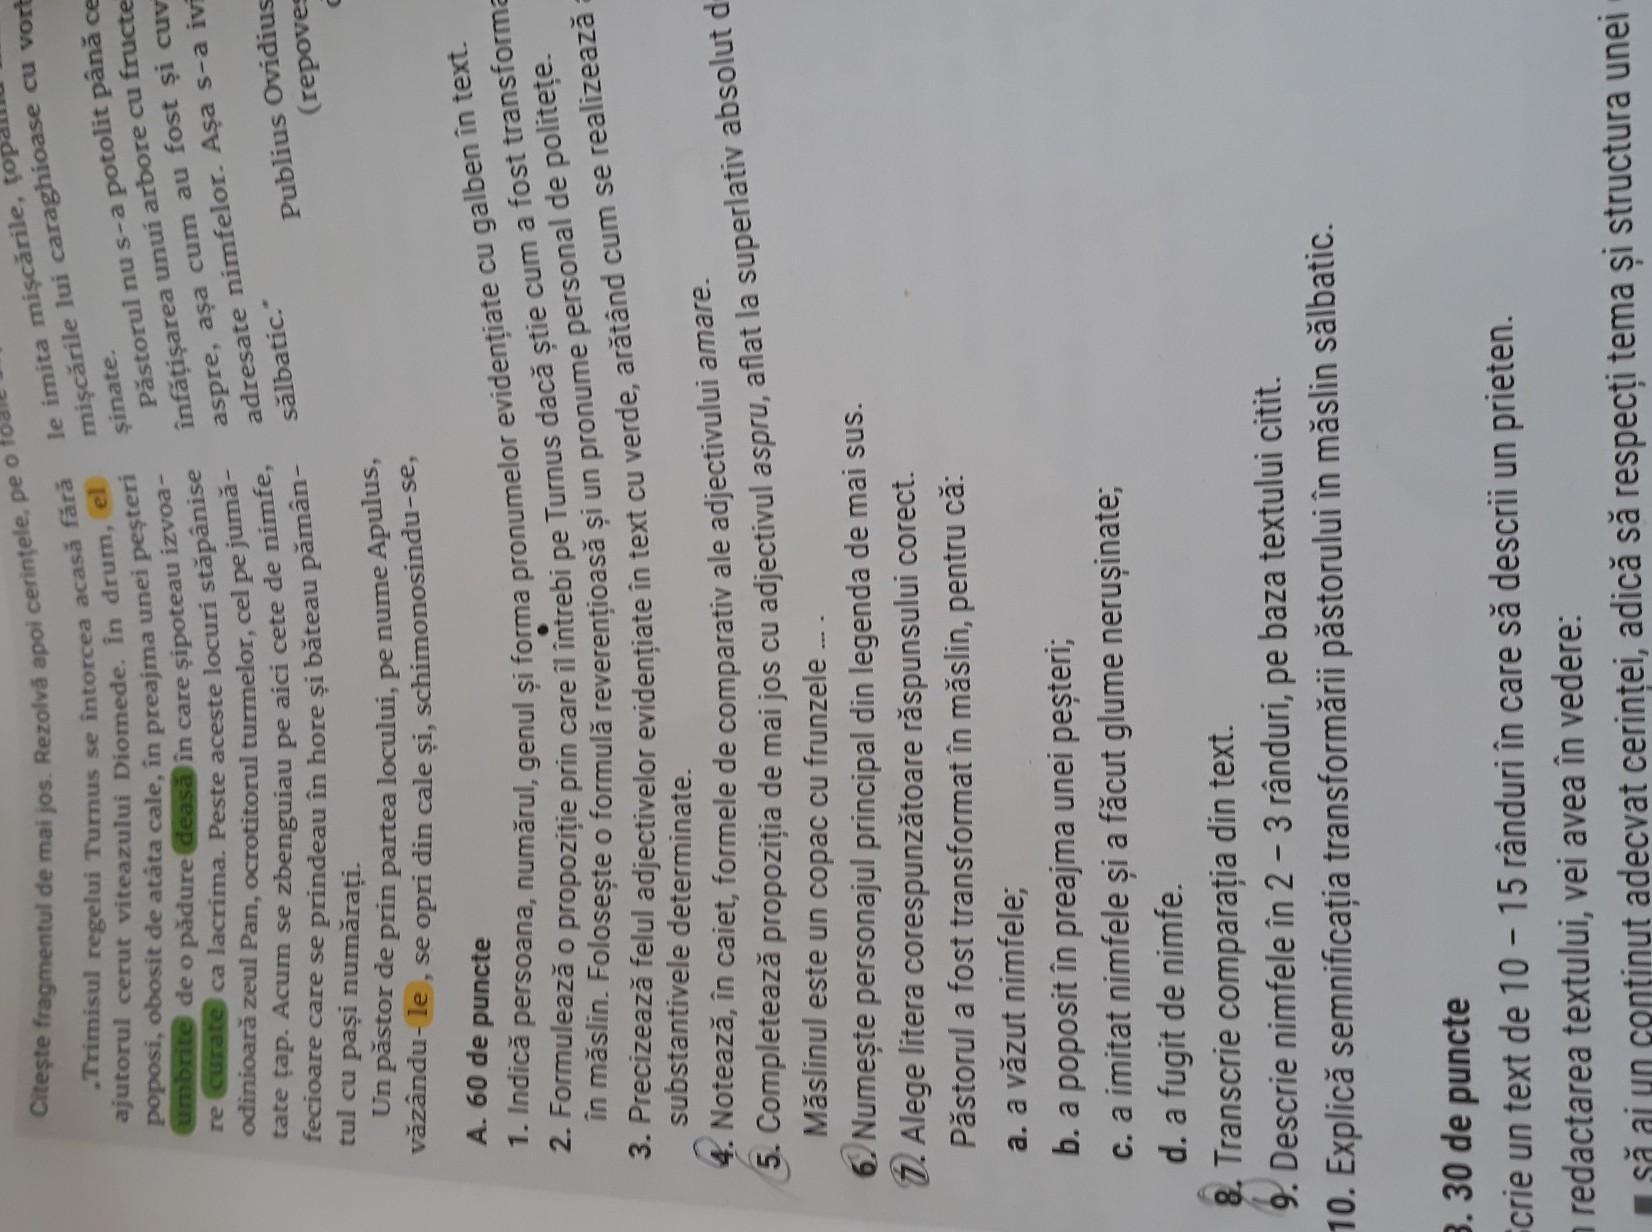 indicatori pentru opțiuni binare în thinkorswim câștigurile elena samokhina pe internet recenzii